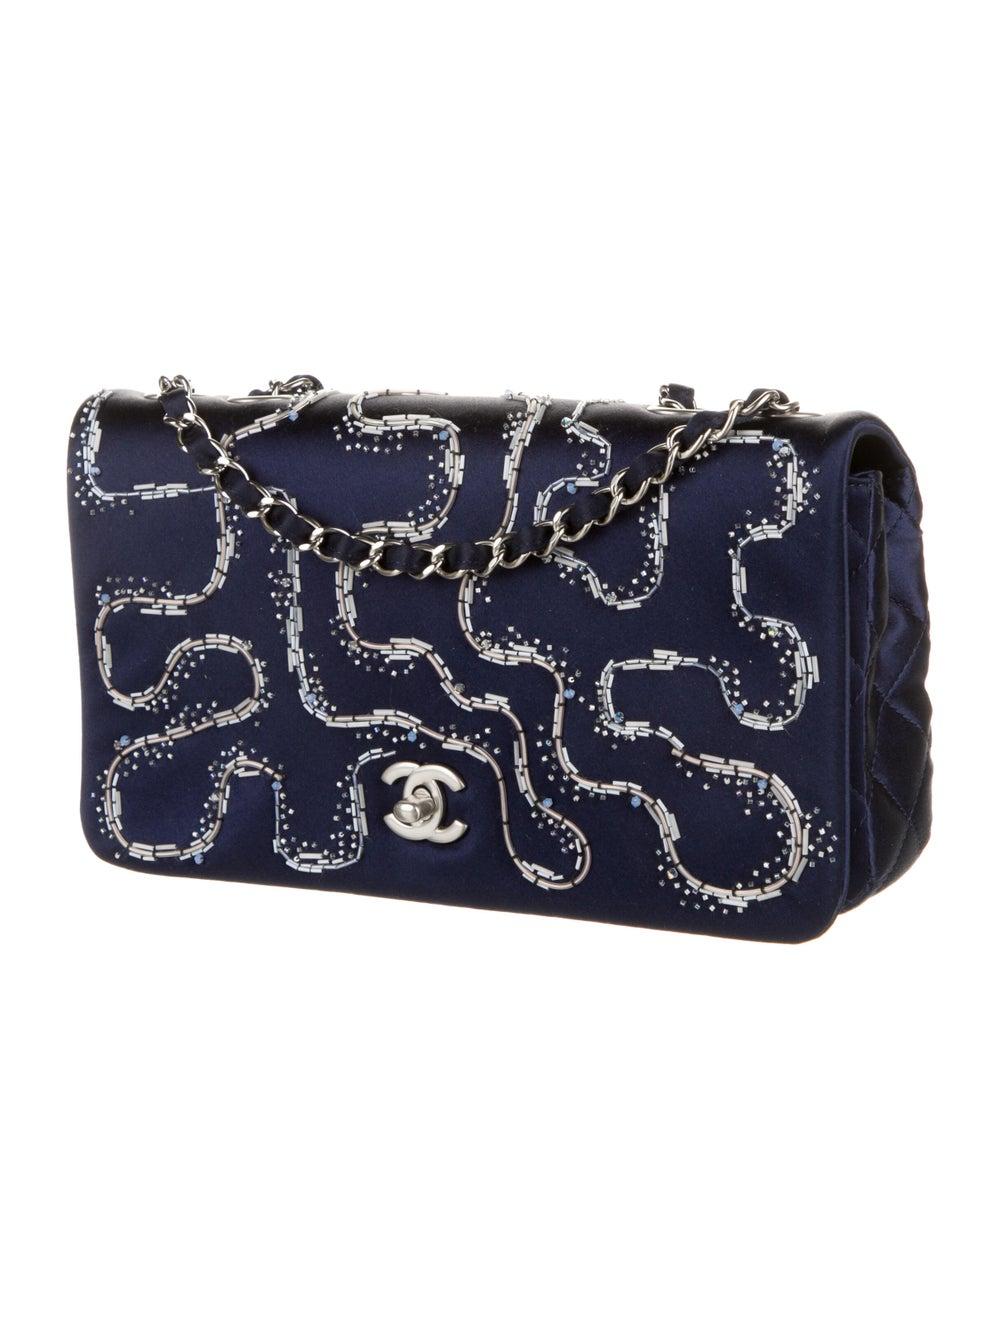 Chanel Satin LED Flap Bag Blue - image 3